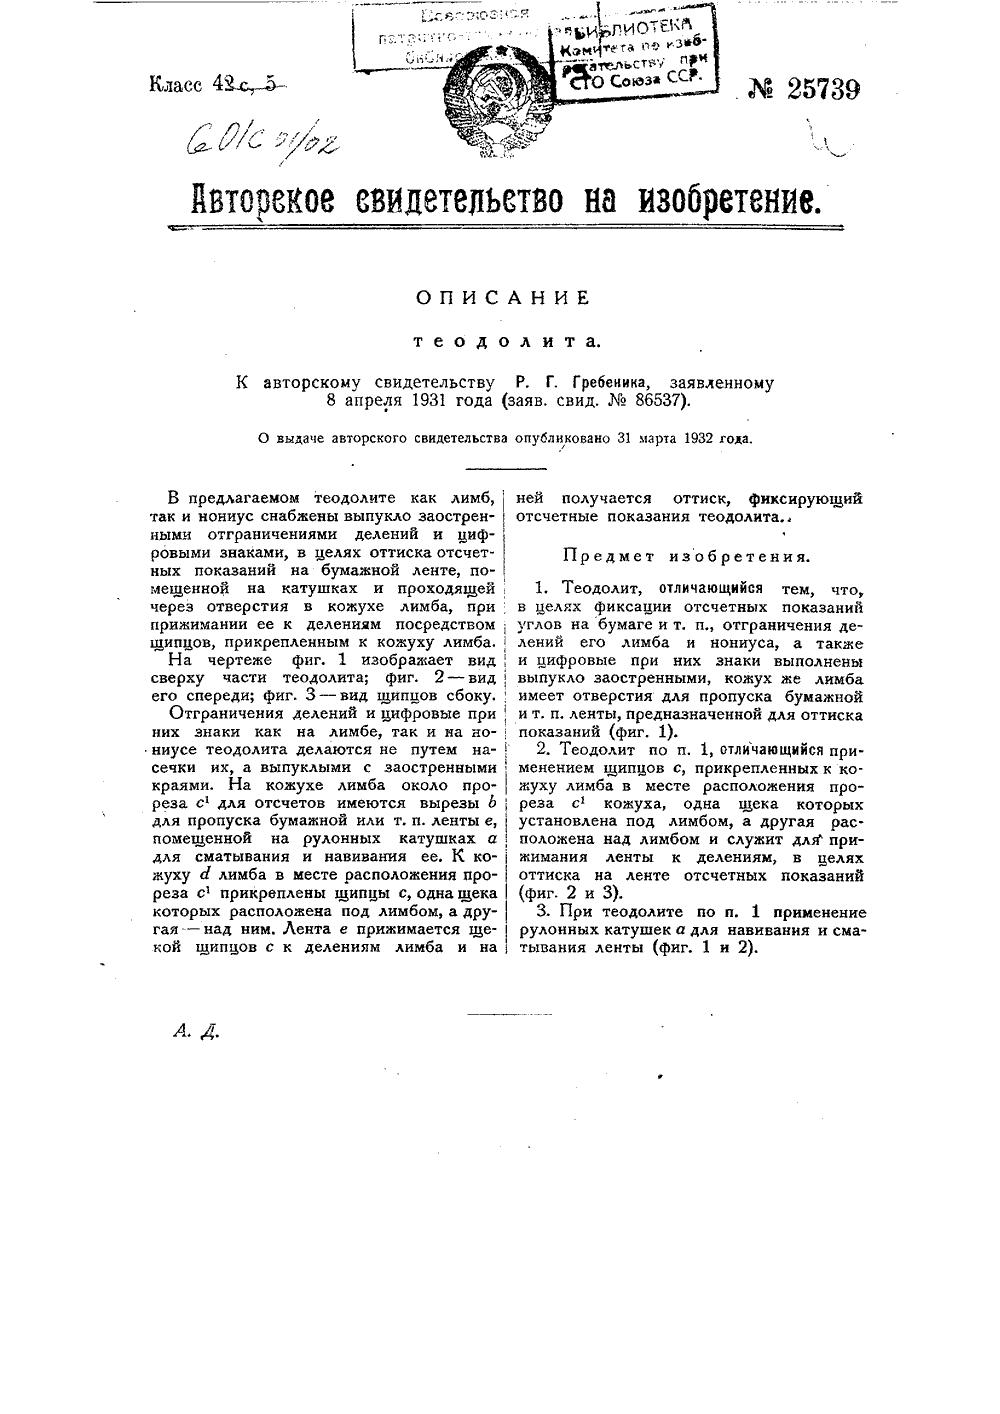 описание теодолит тео 20в инструкция